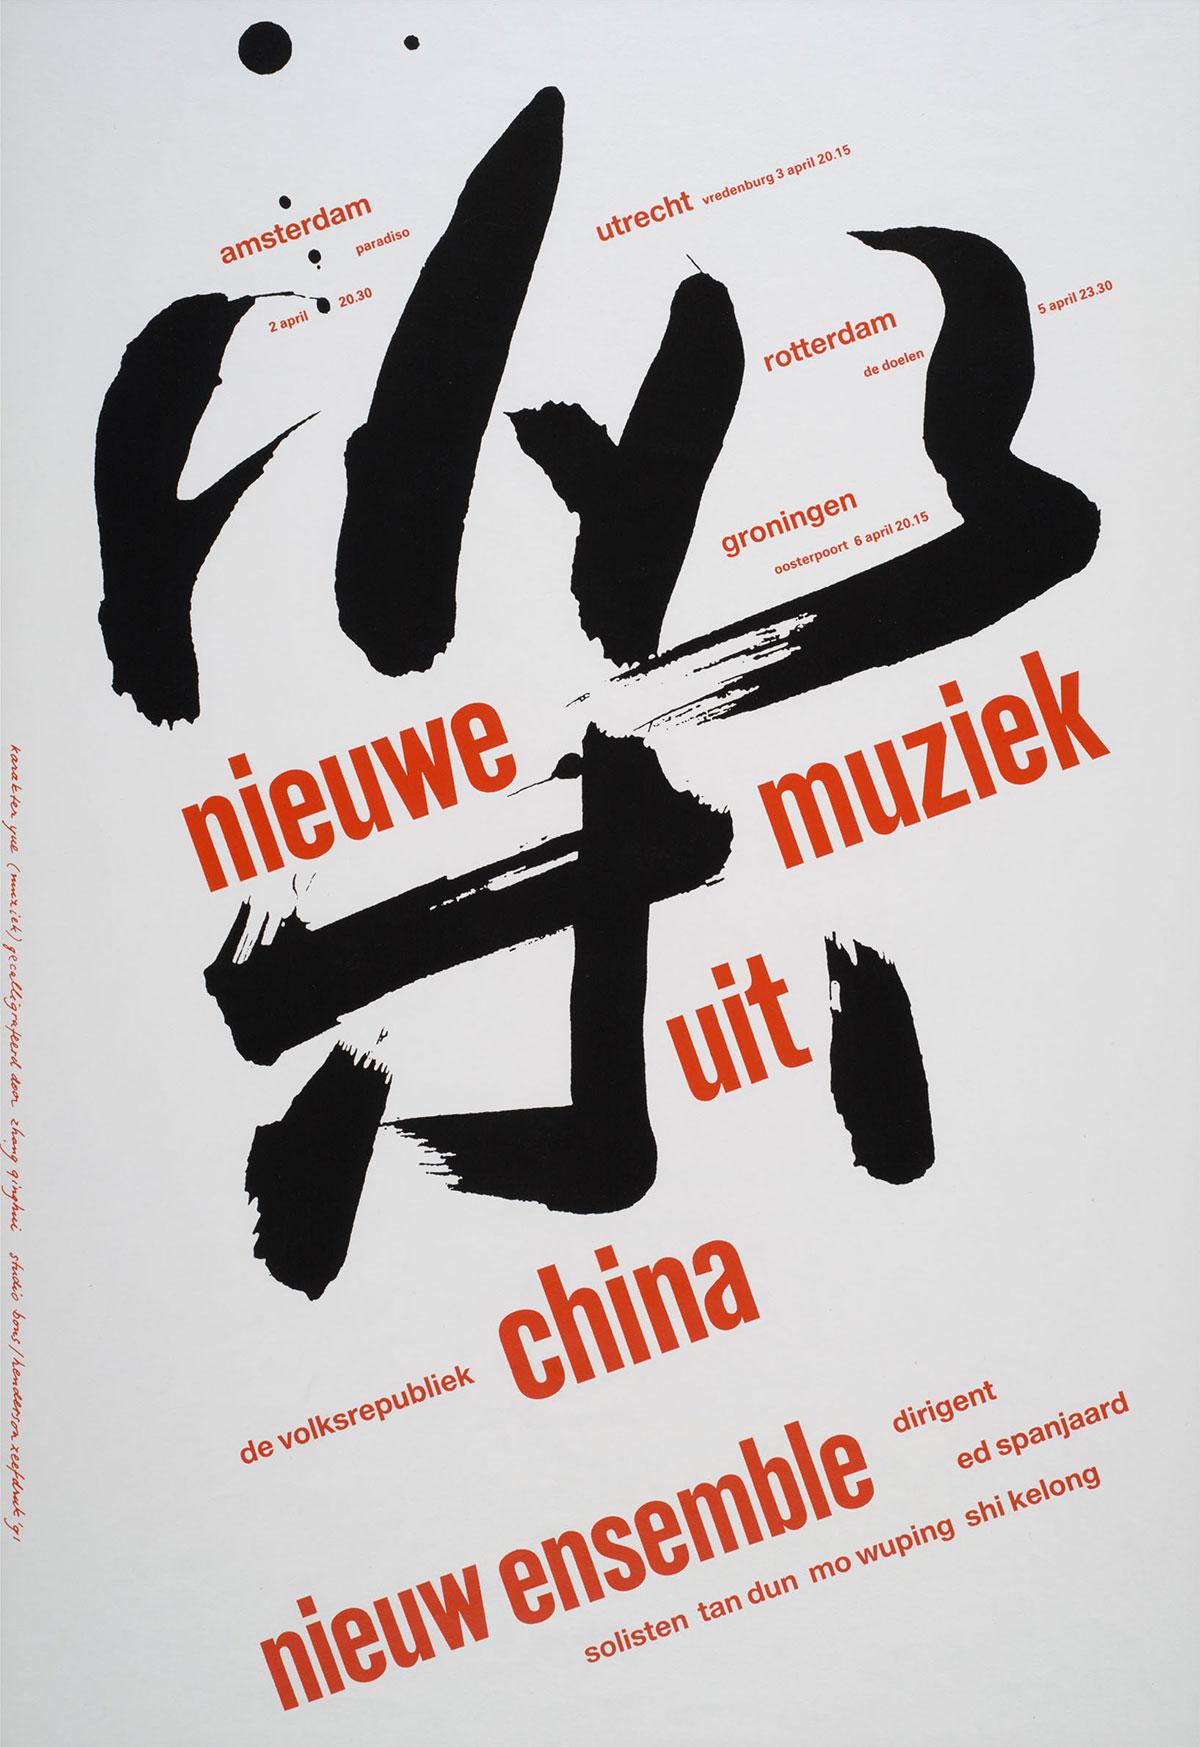 Jan-Bons-affiche-Nieuw-ensemble,-nieuwe-muziek-uit-China-1991